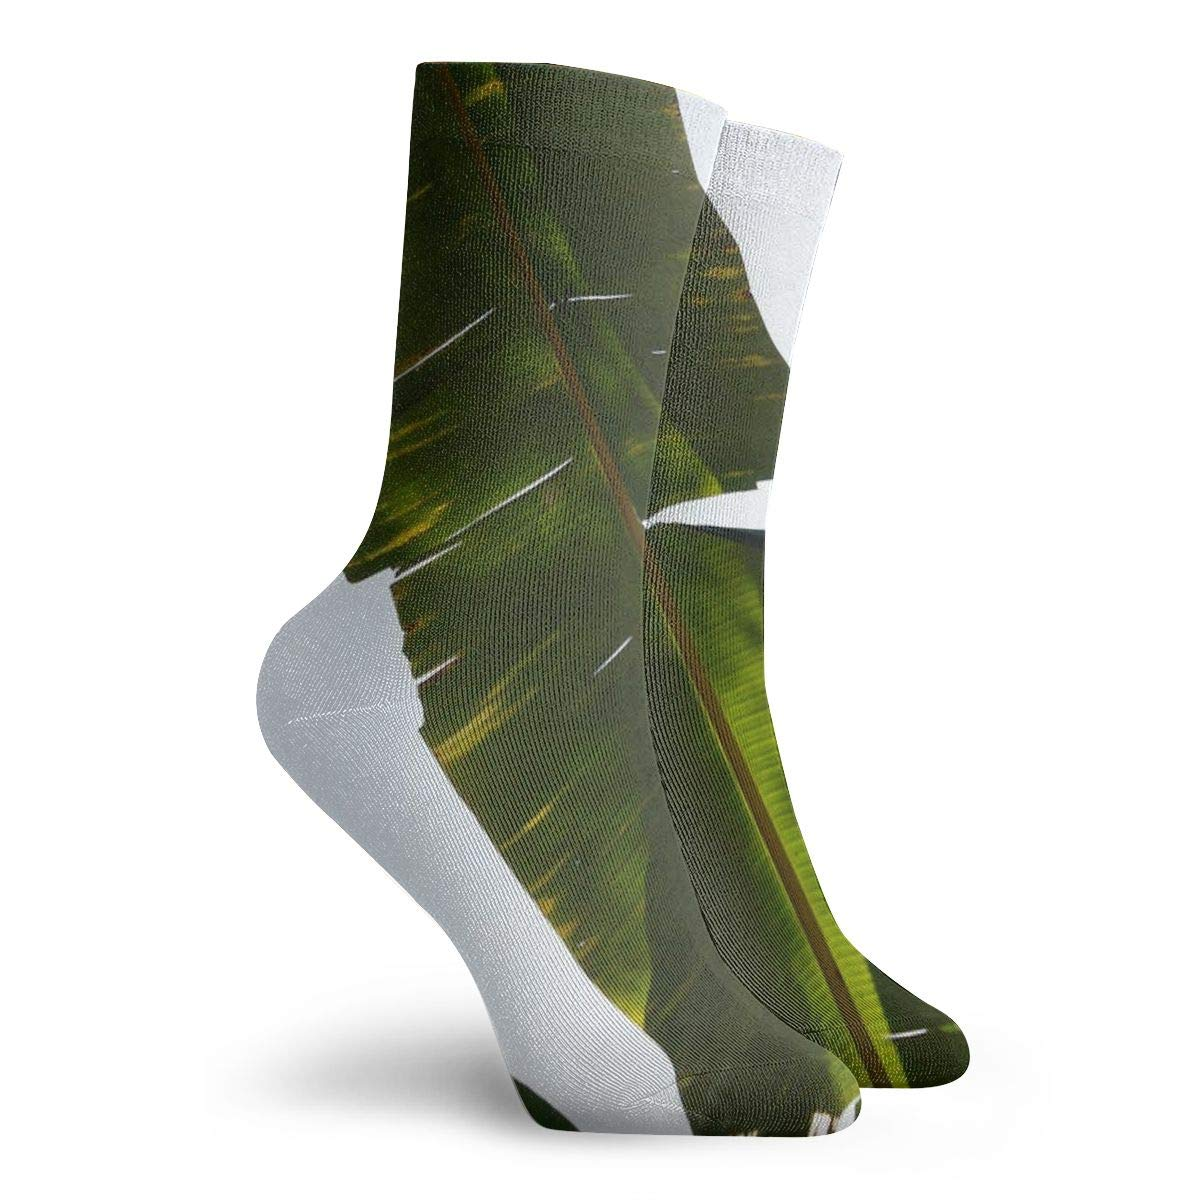 White Leaf Cotton Sports Socks?2 Packs